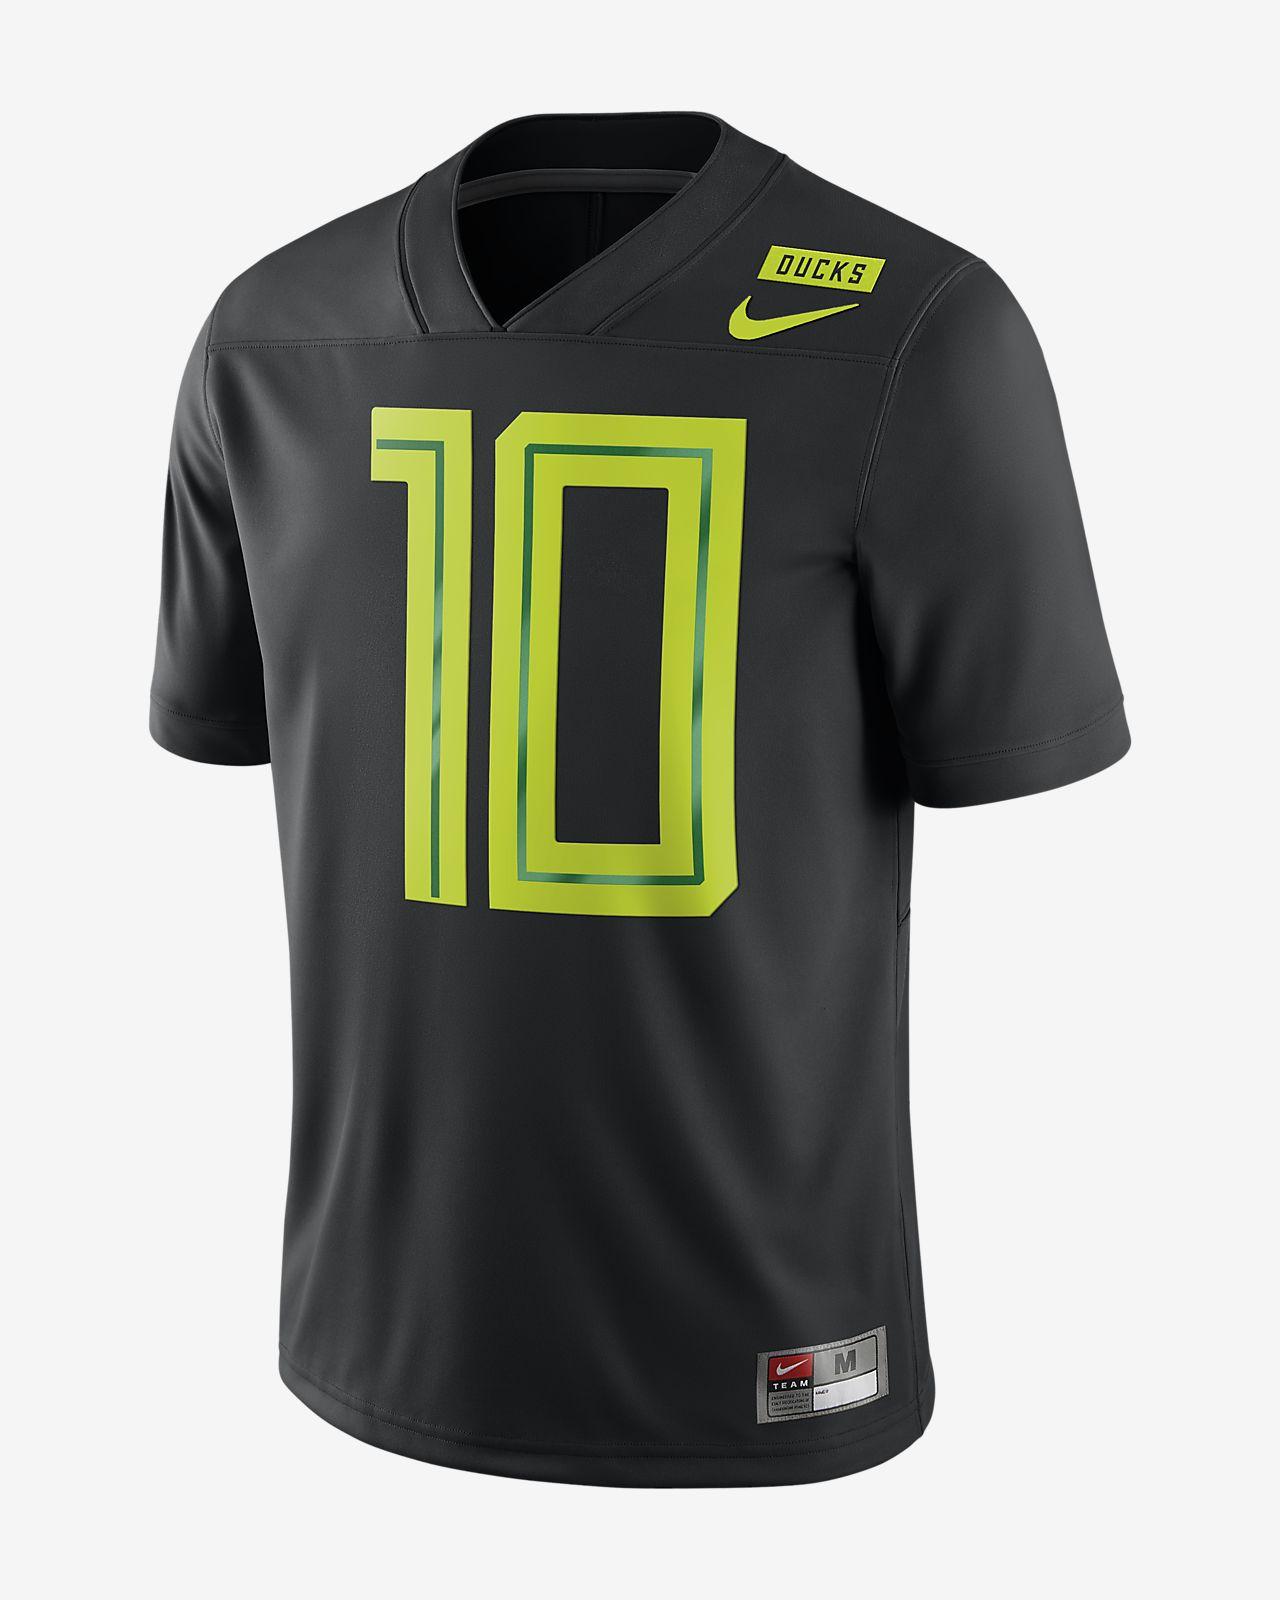 2da0069b27c Nike College Game (Oregon) Men s Football Jersey. Nike.com